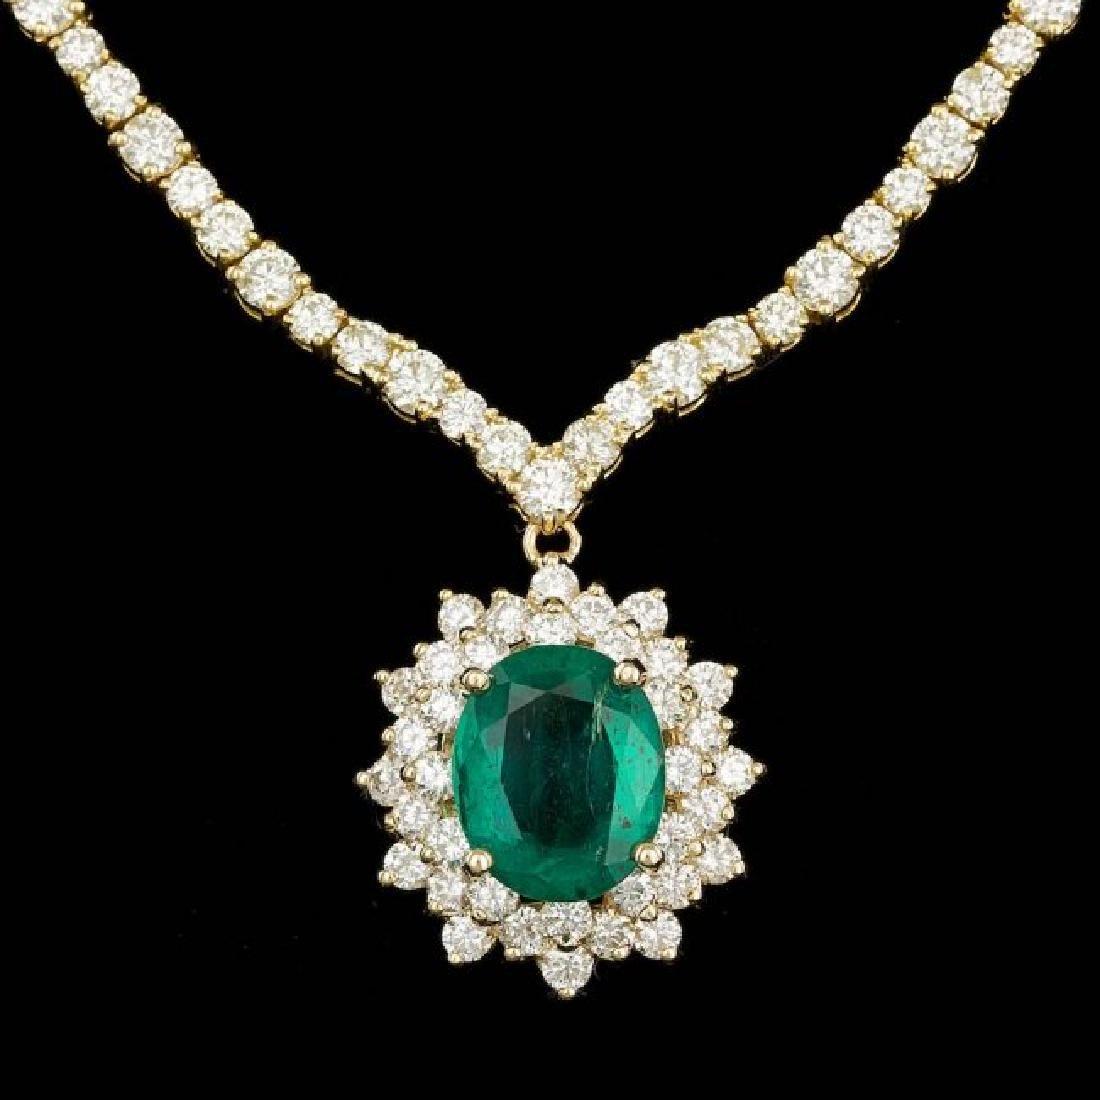 18k Gold 5.00ct Emerald 14.85ct Diamond Necklace